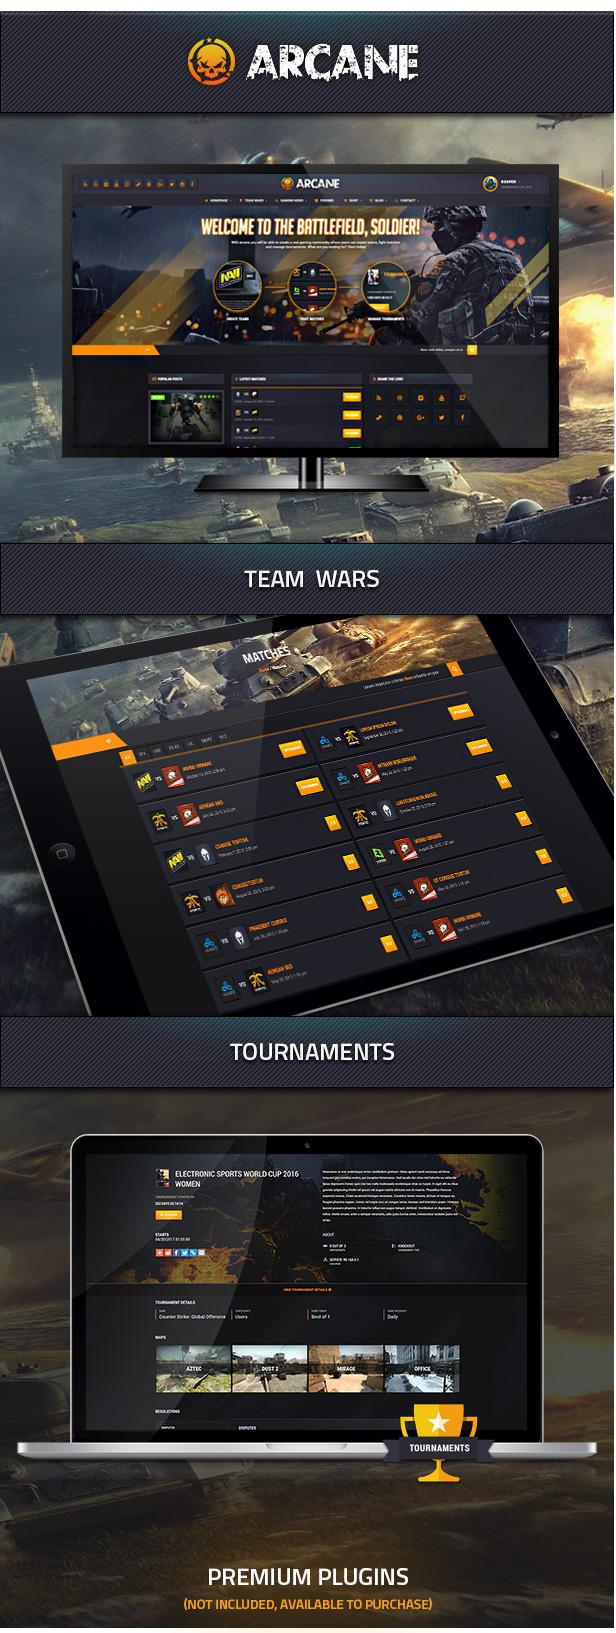 Arcane - The Gaming Community Theme - 1